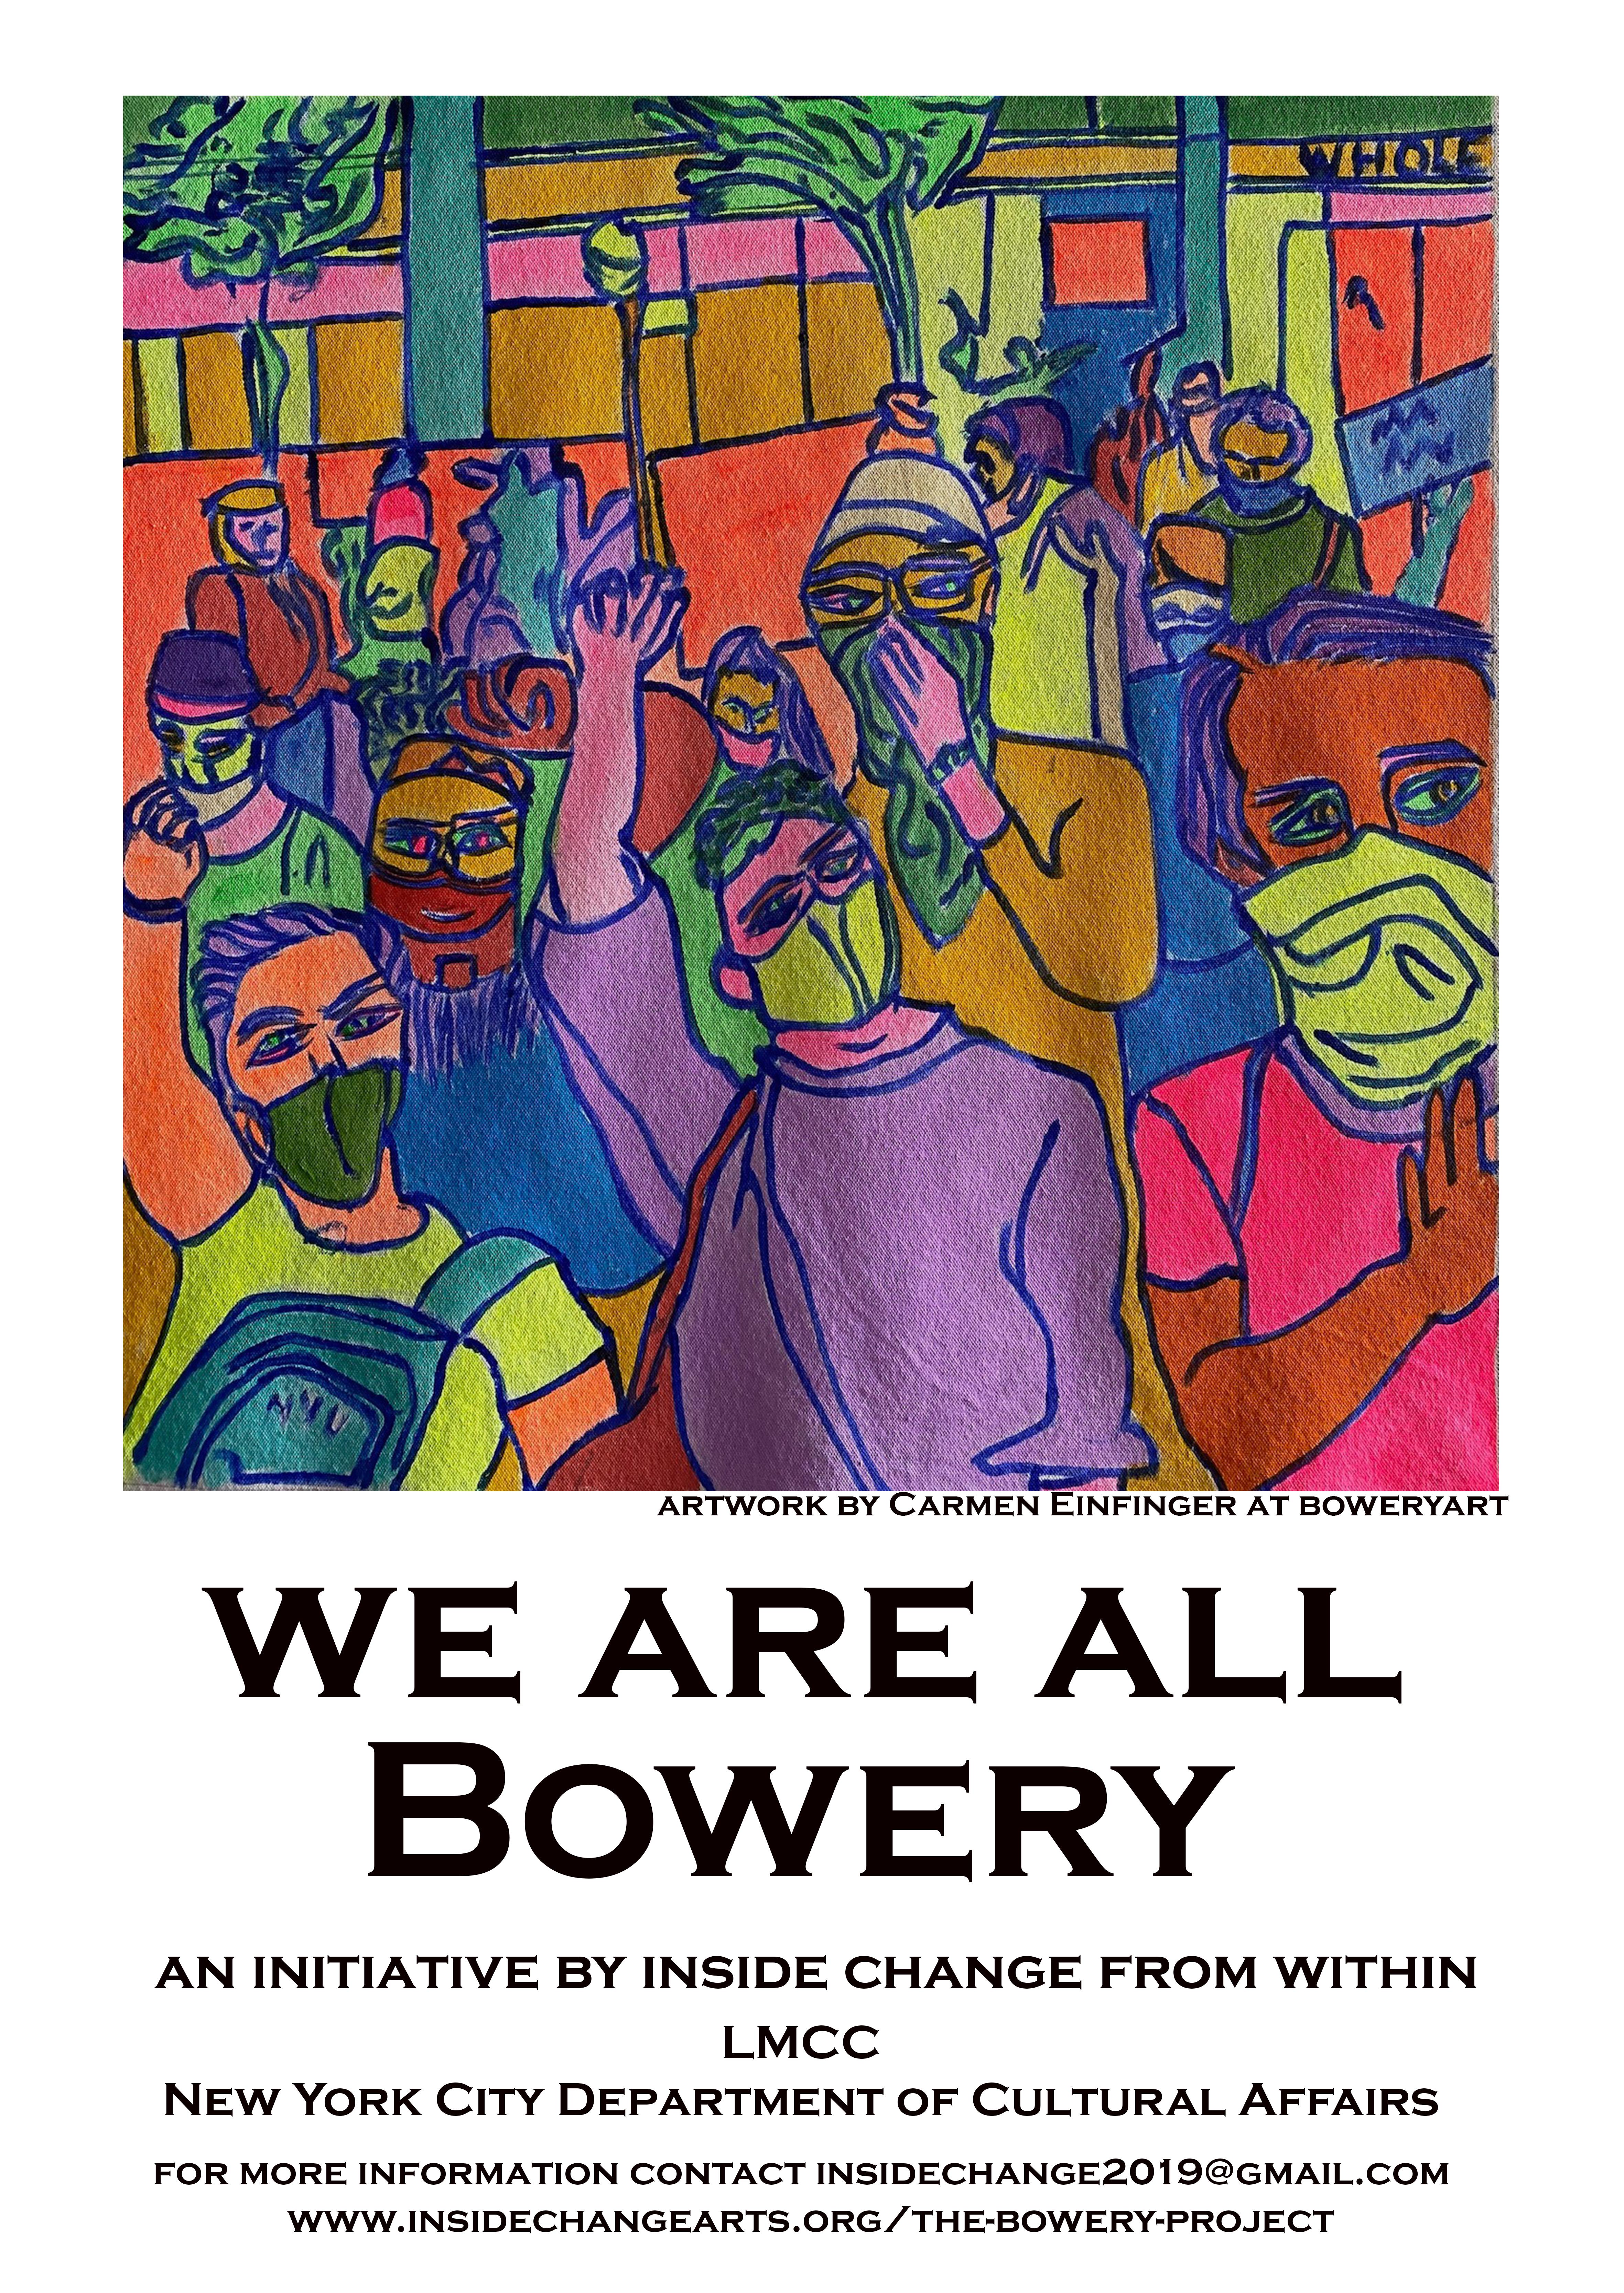 BoweryCarmen5 (1)